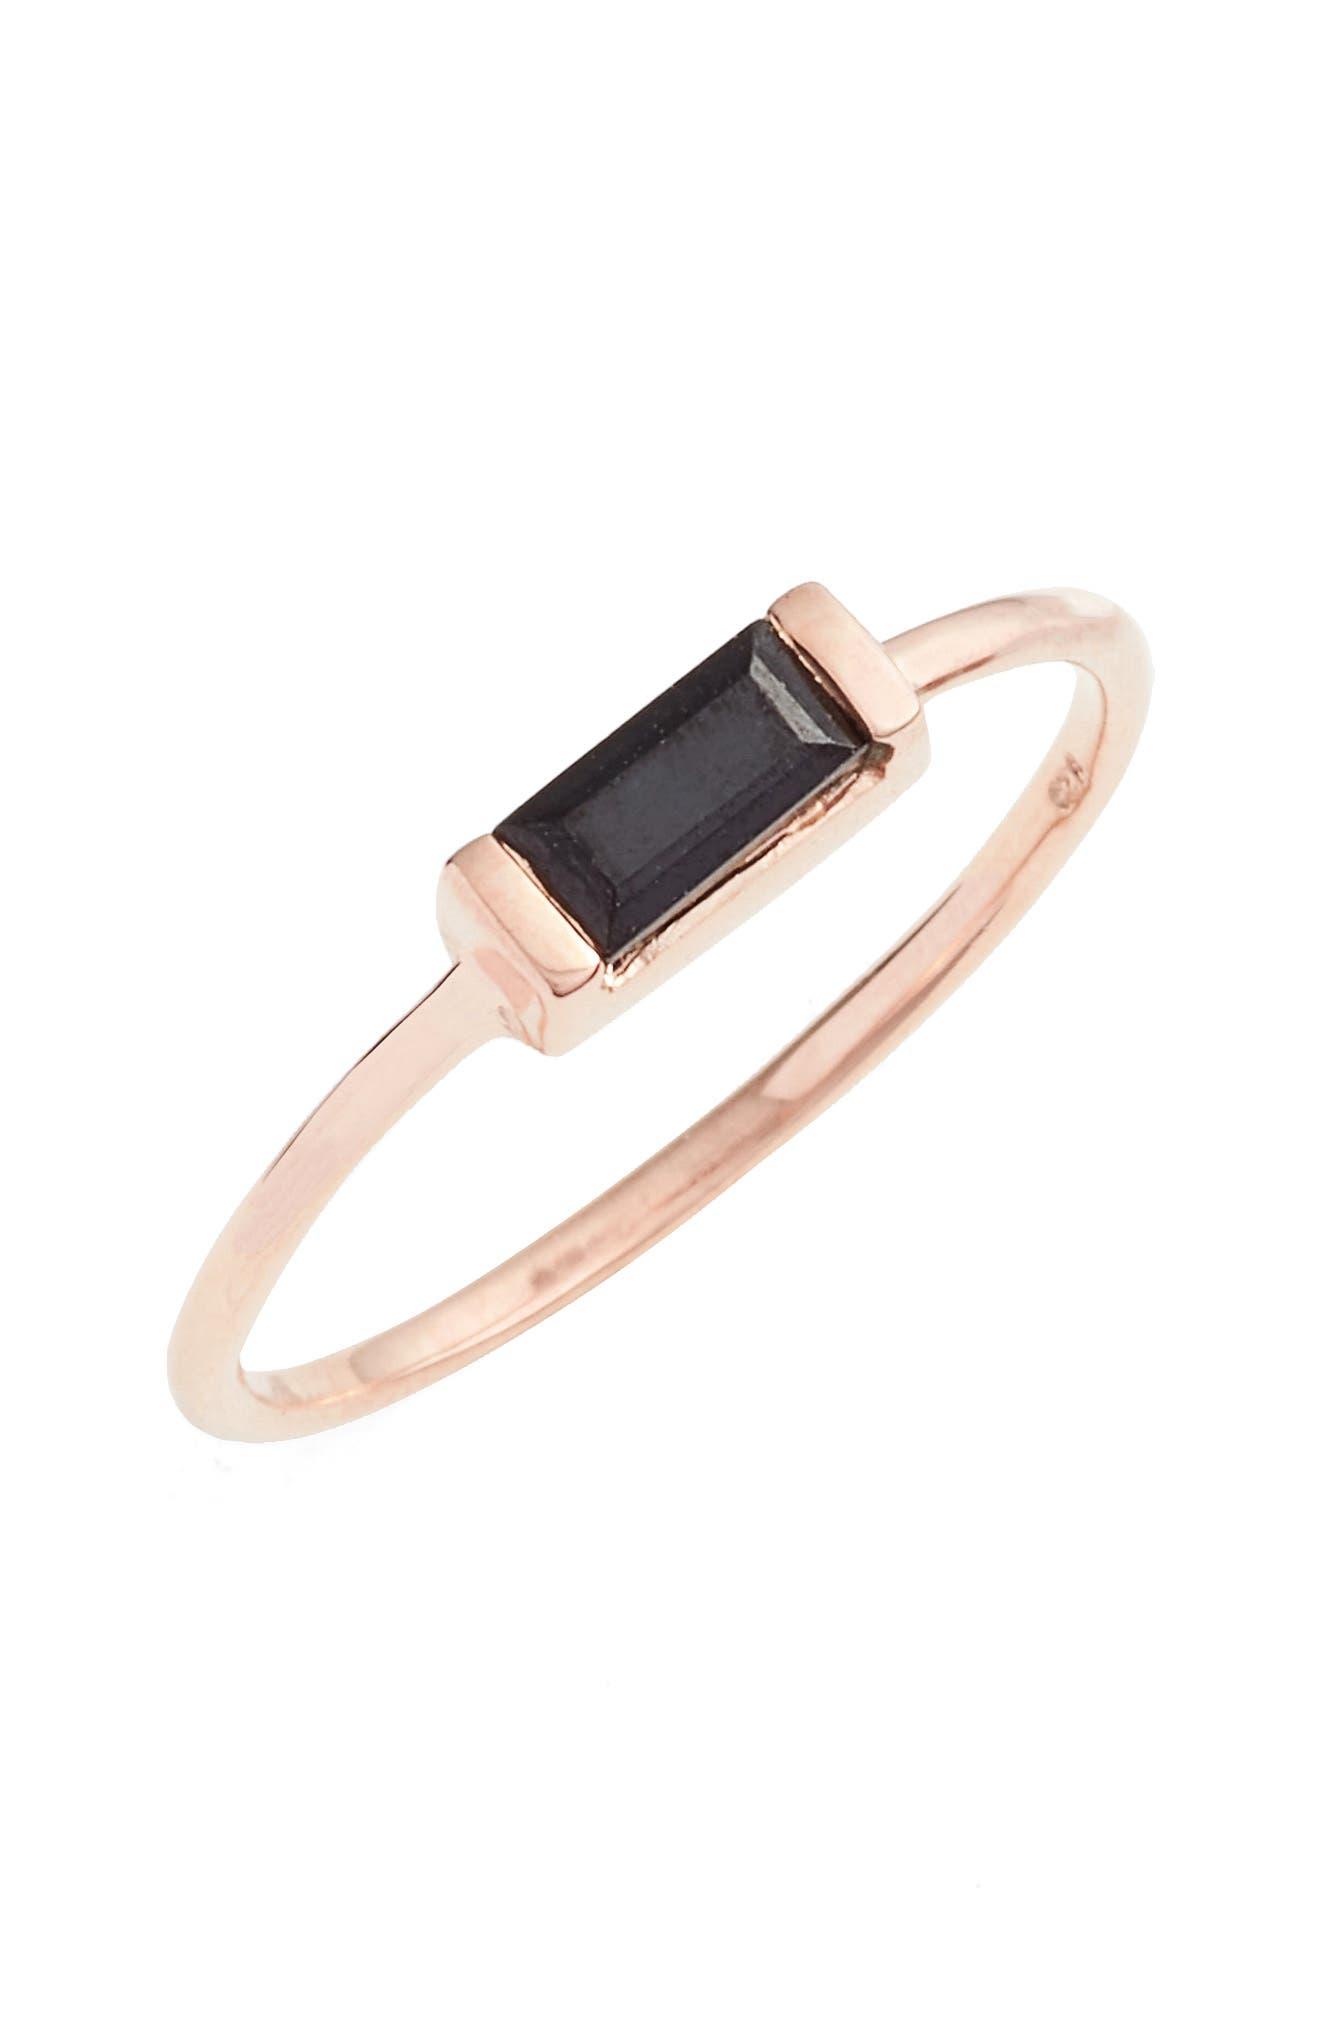 Leah Alexandra Stone Ring